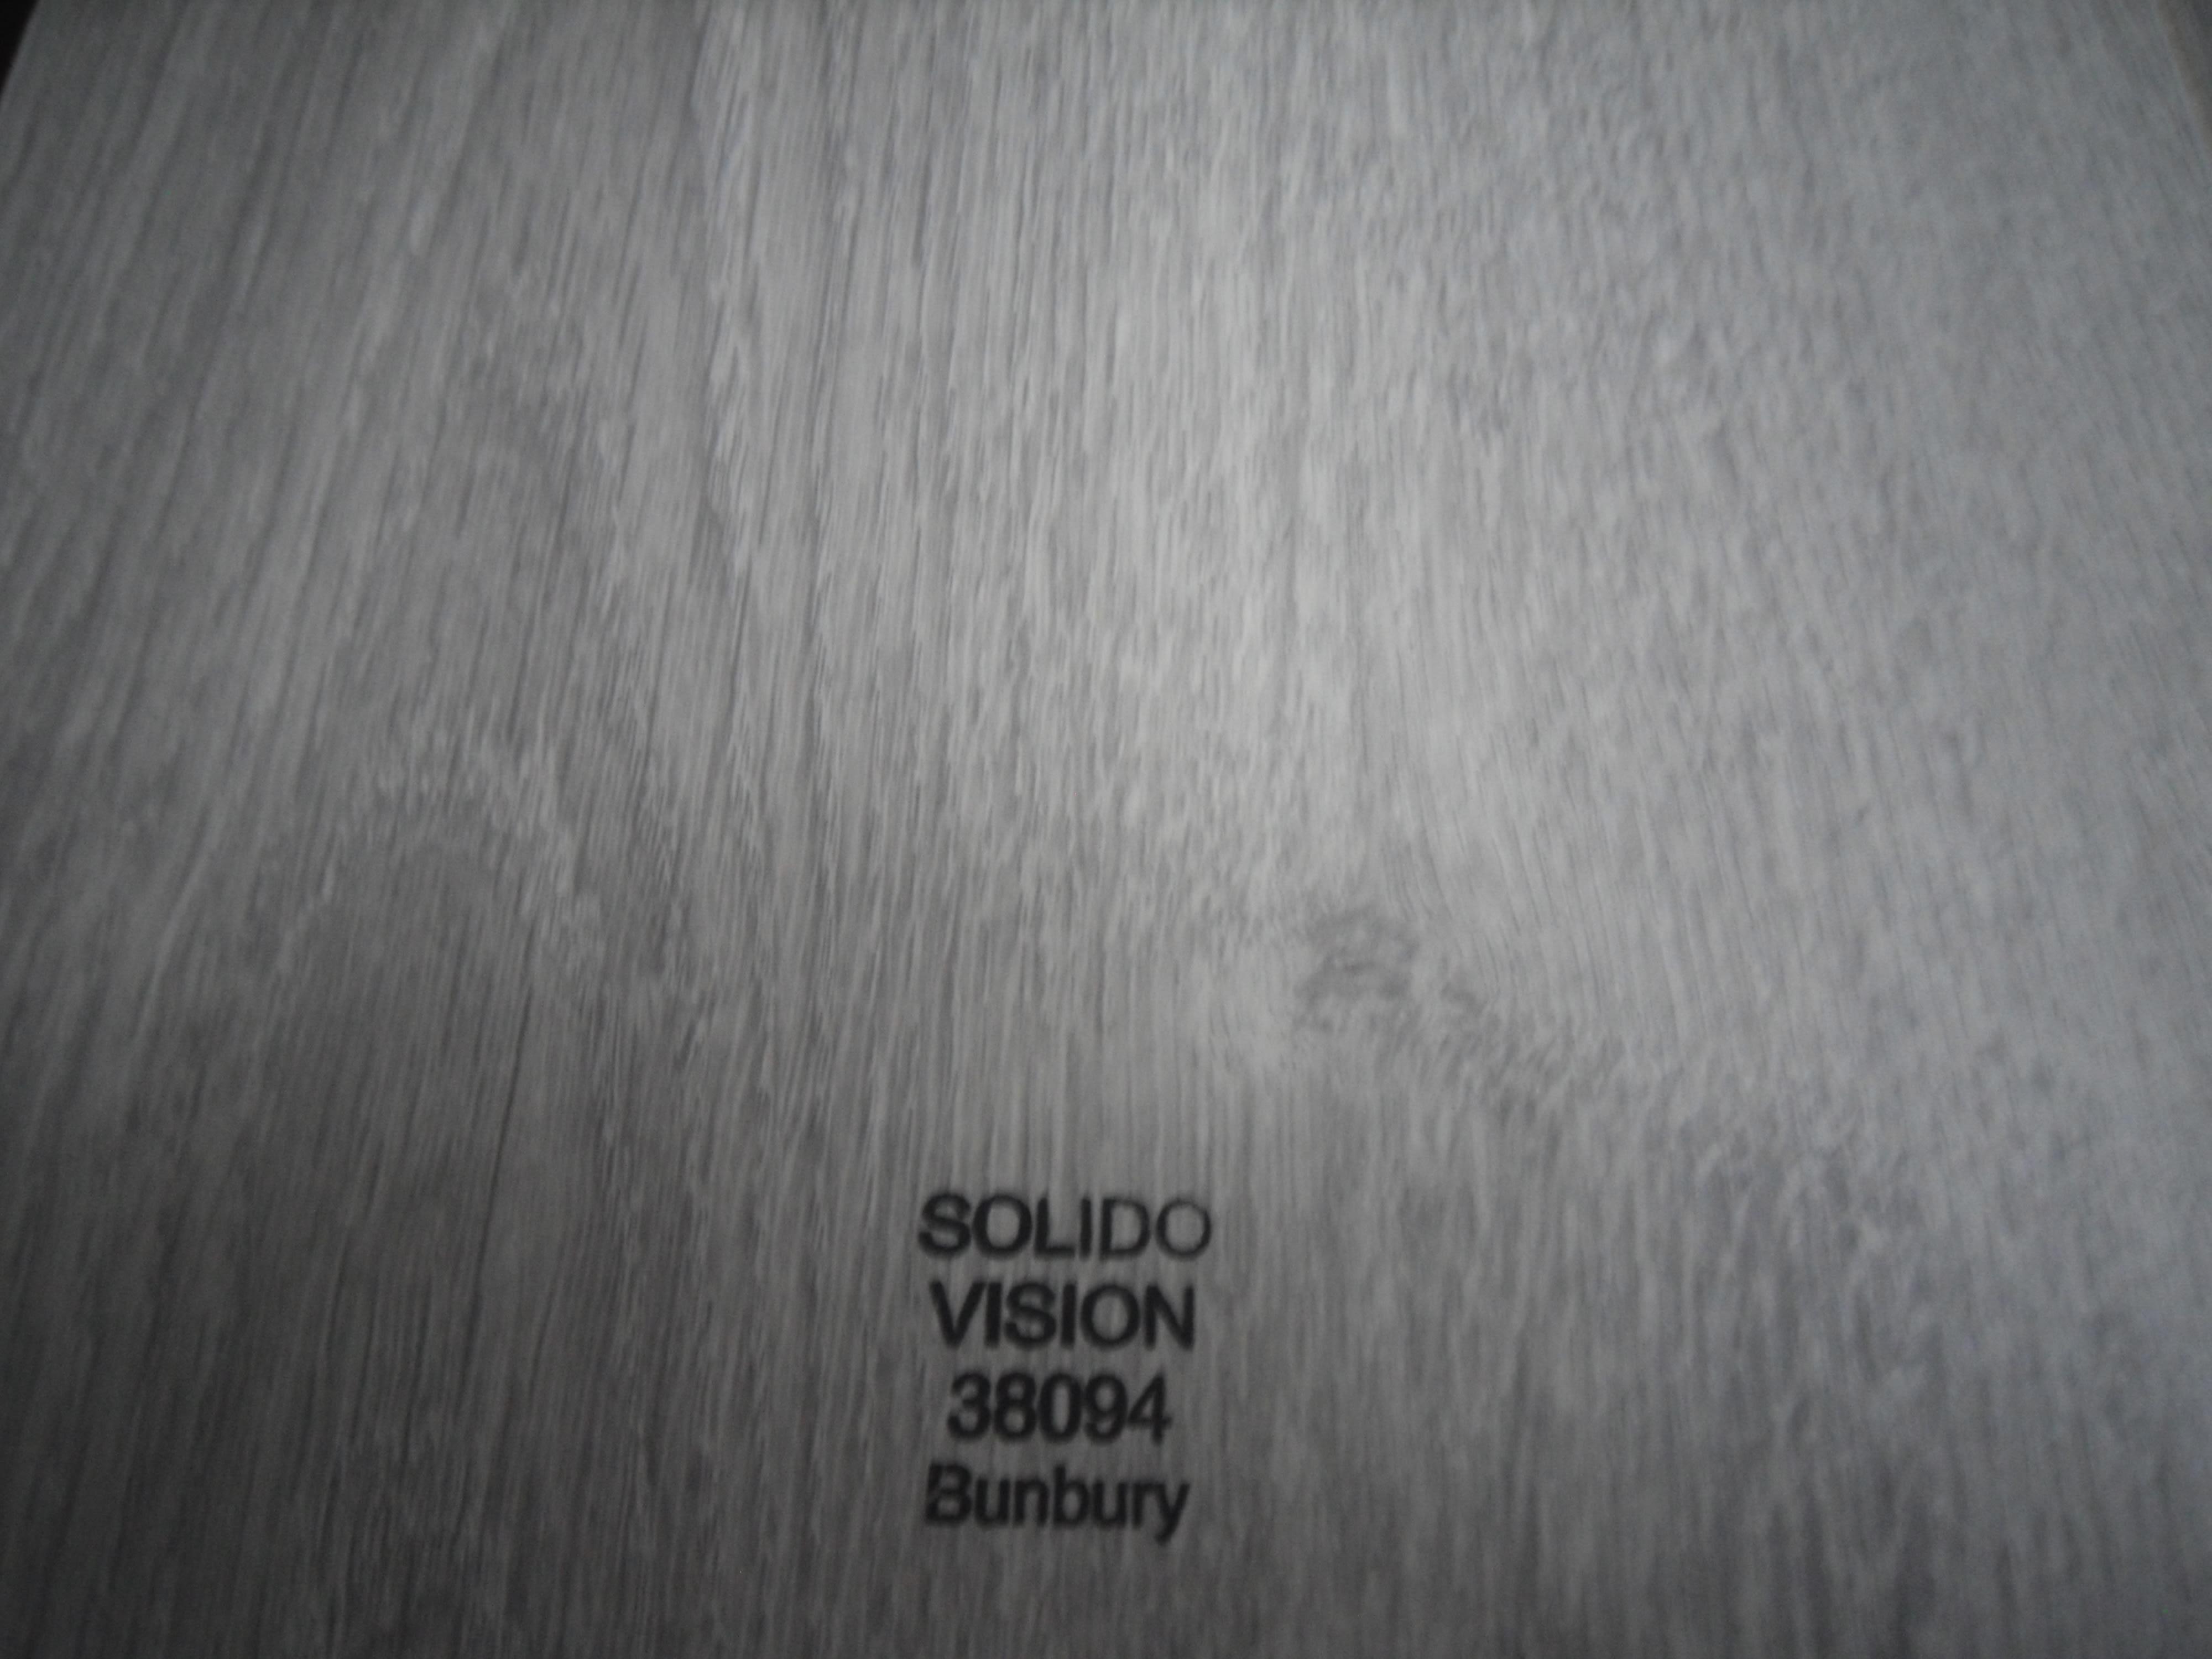 Solido Vision Bunbury Laminate, Solido Vision Laminate Flooring